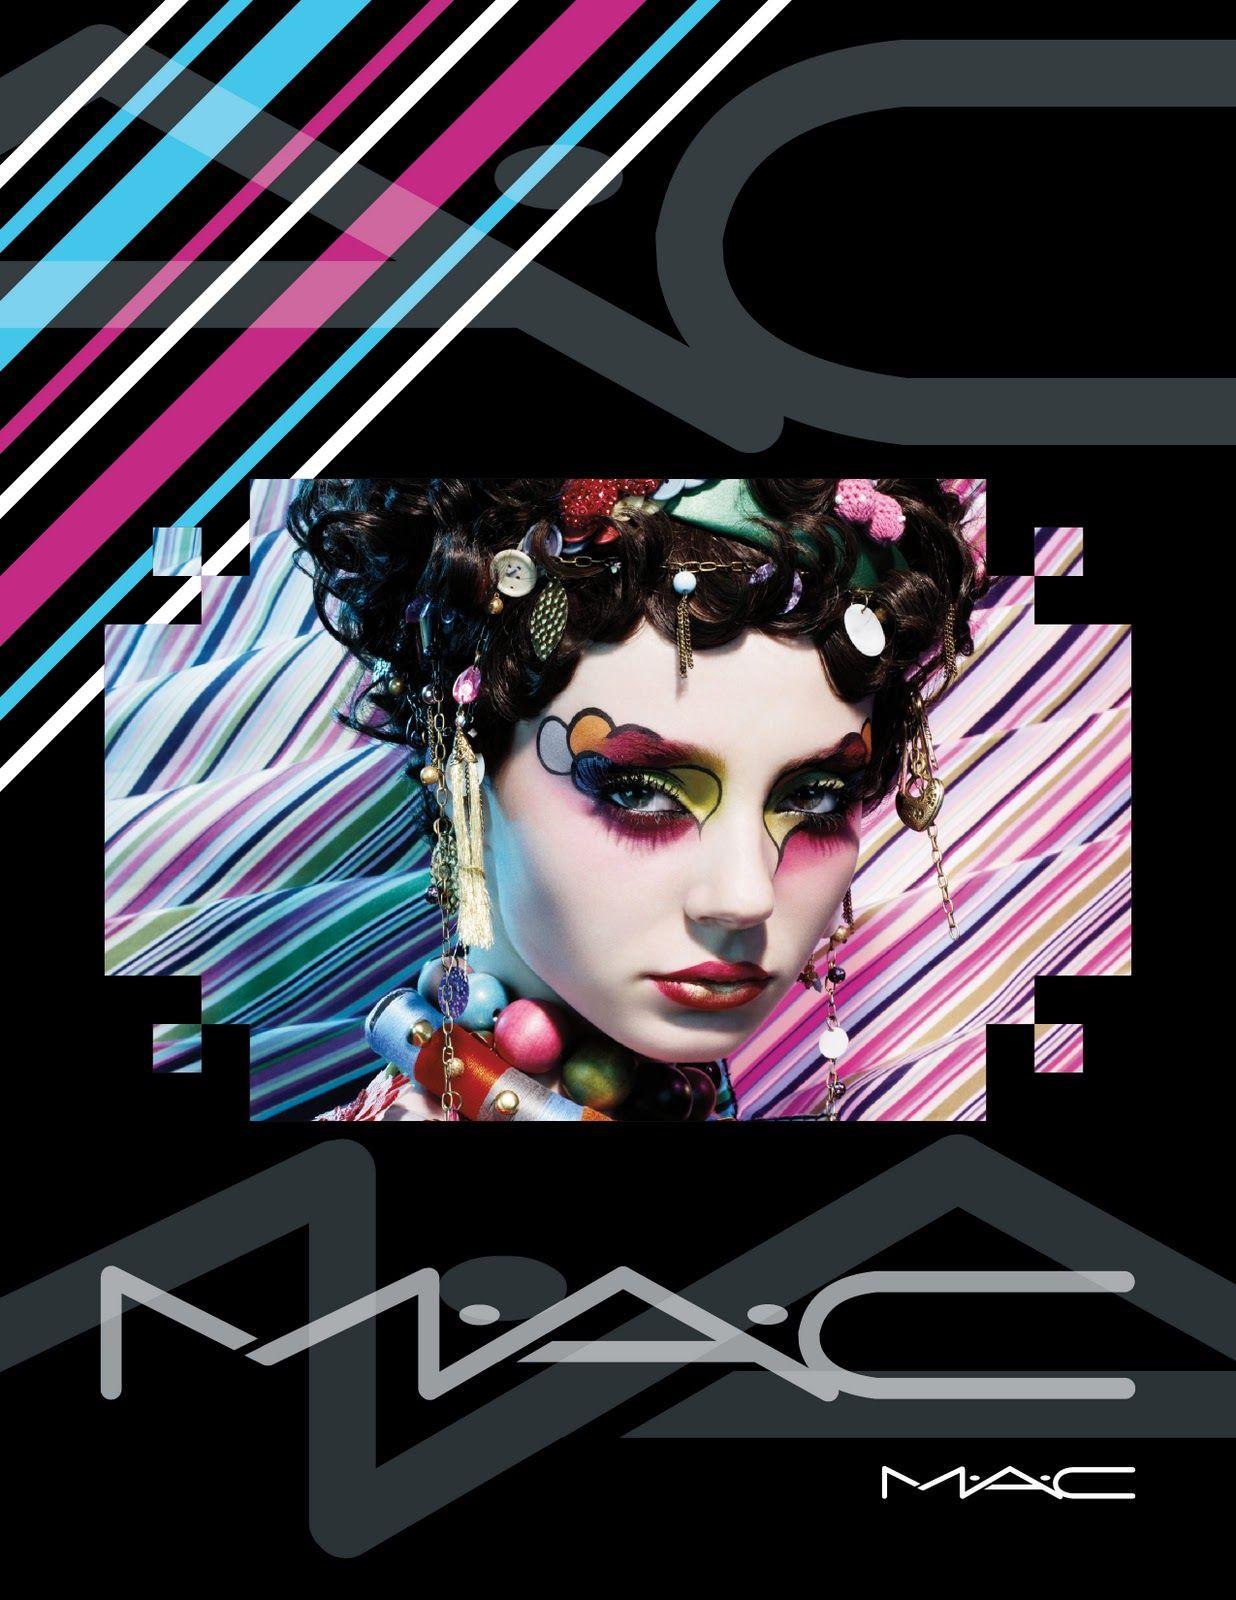 Poster design for mac - Mac Cosmetic Eyeshadow Ad